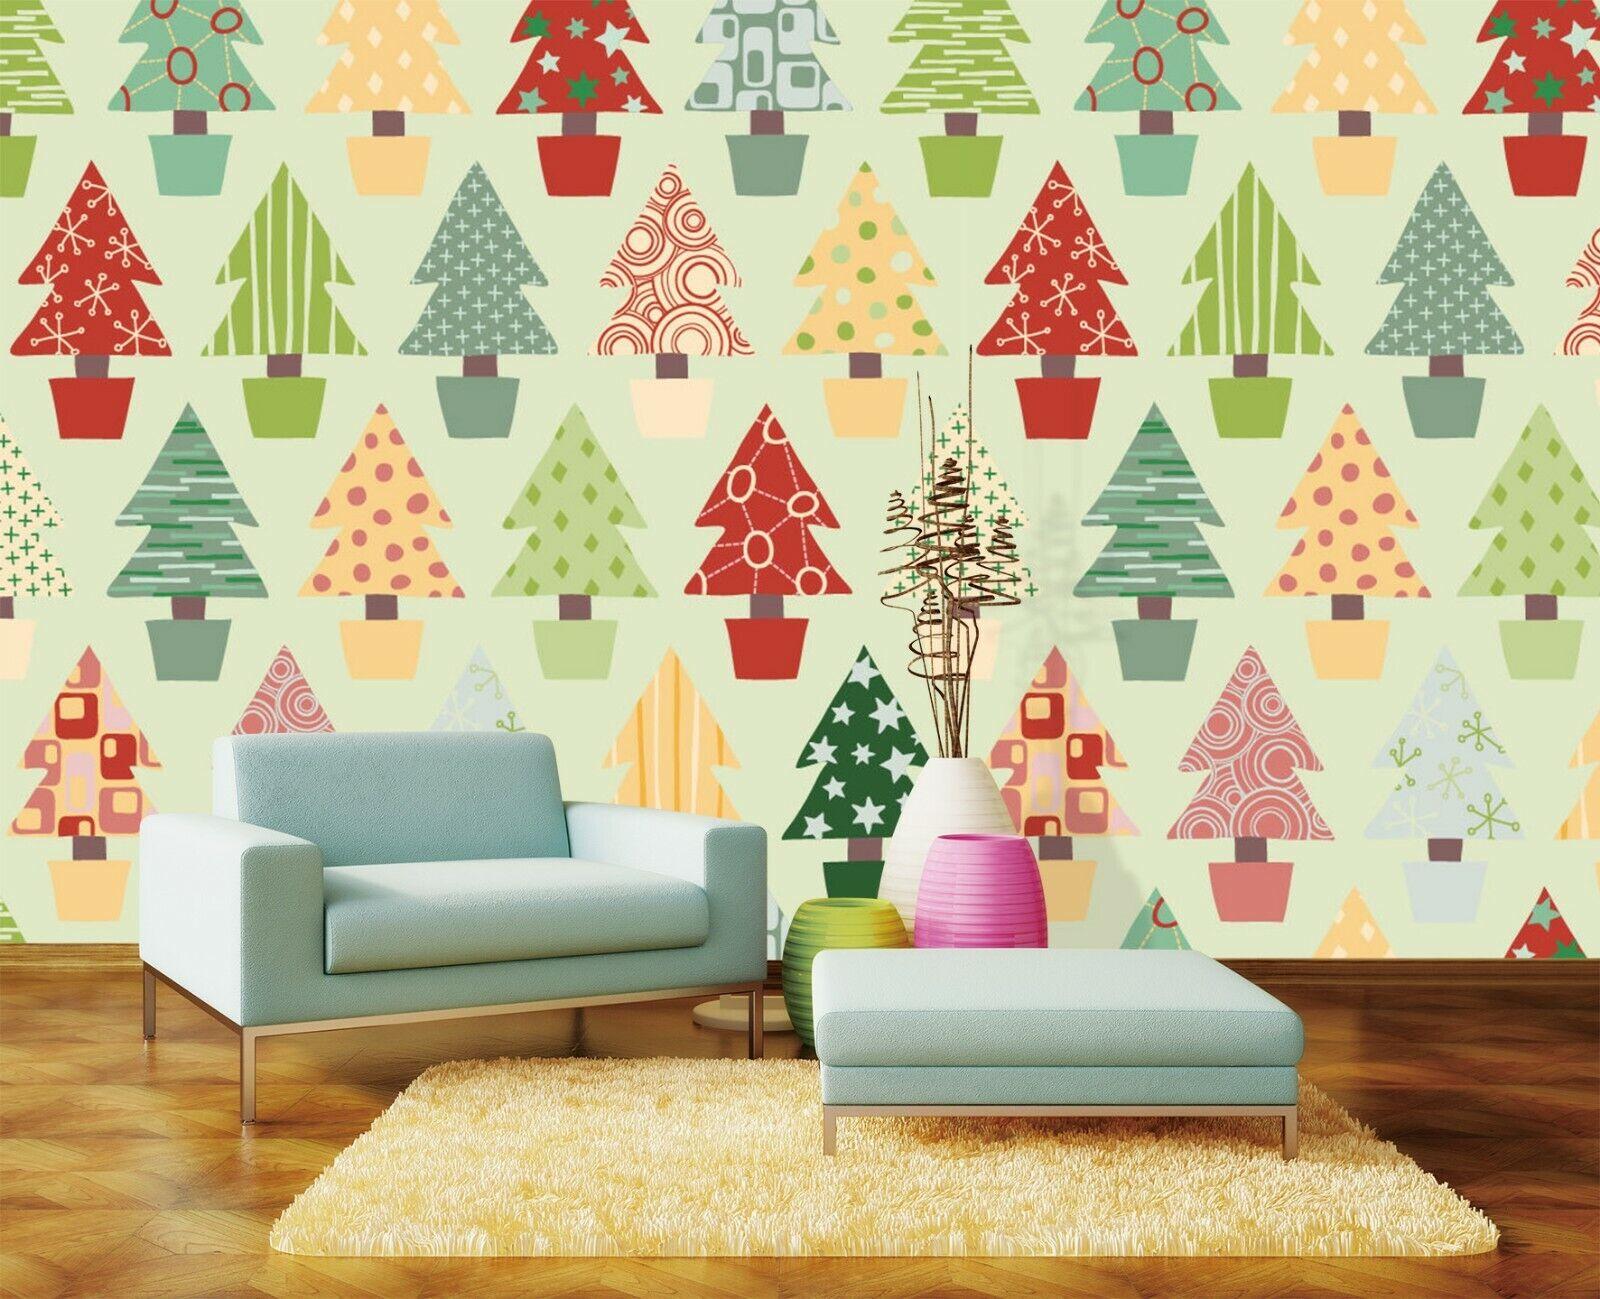 3D Farbe Baum H650 Christmas Tapete Wandbild Selbstklebend Abnehmbare Amy